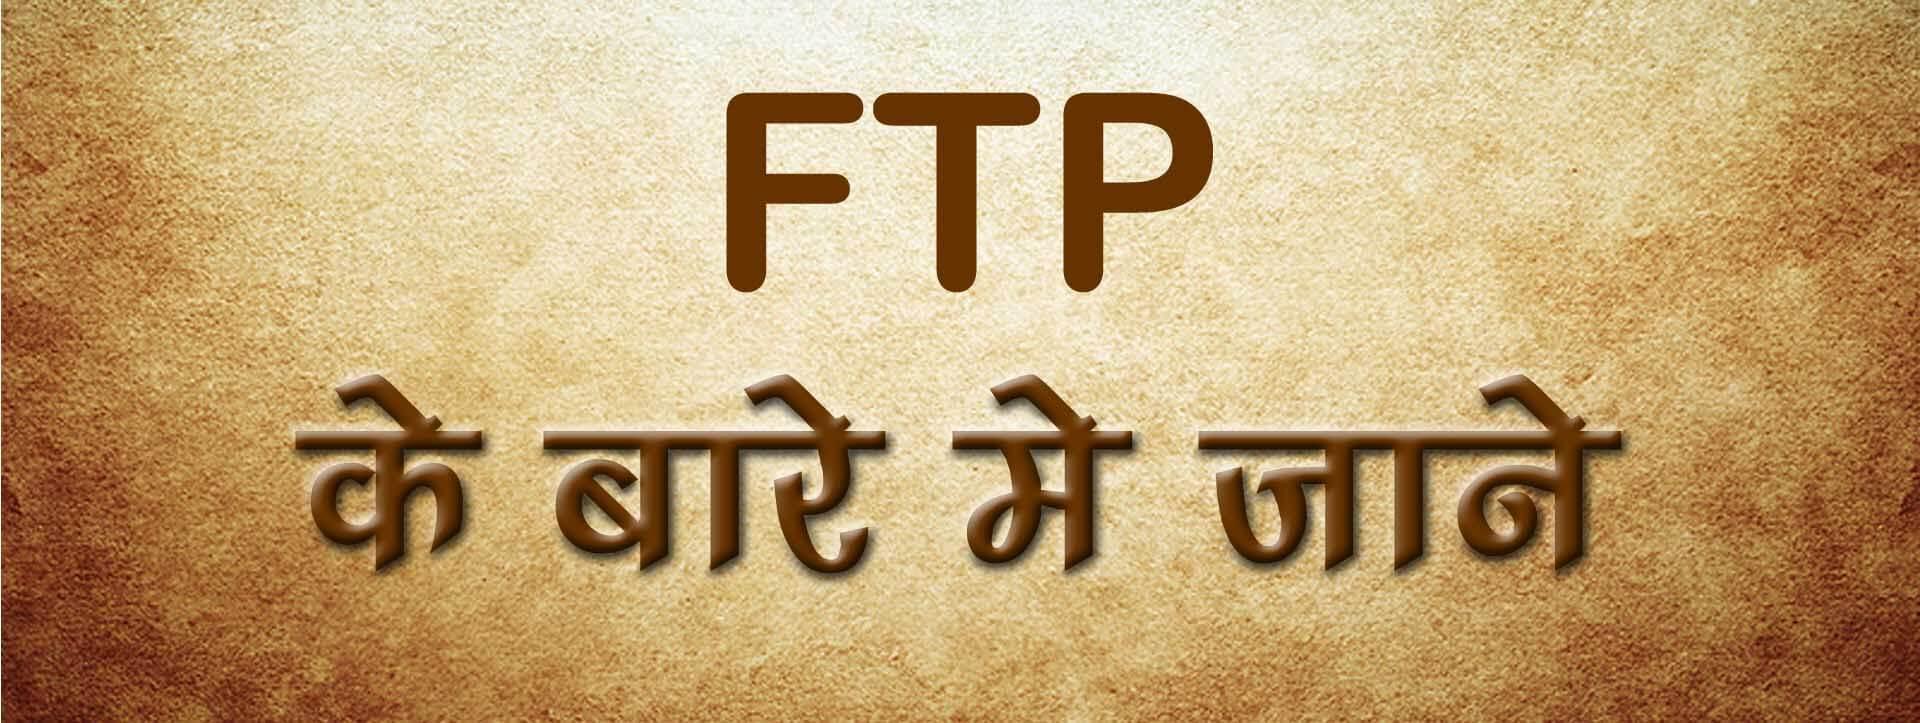 ftp protocol kya hota hai